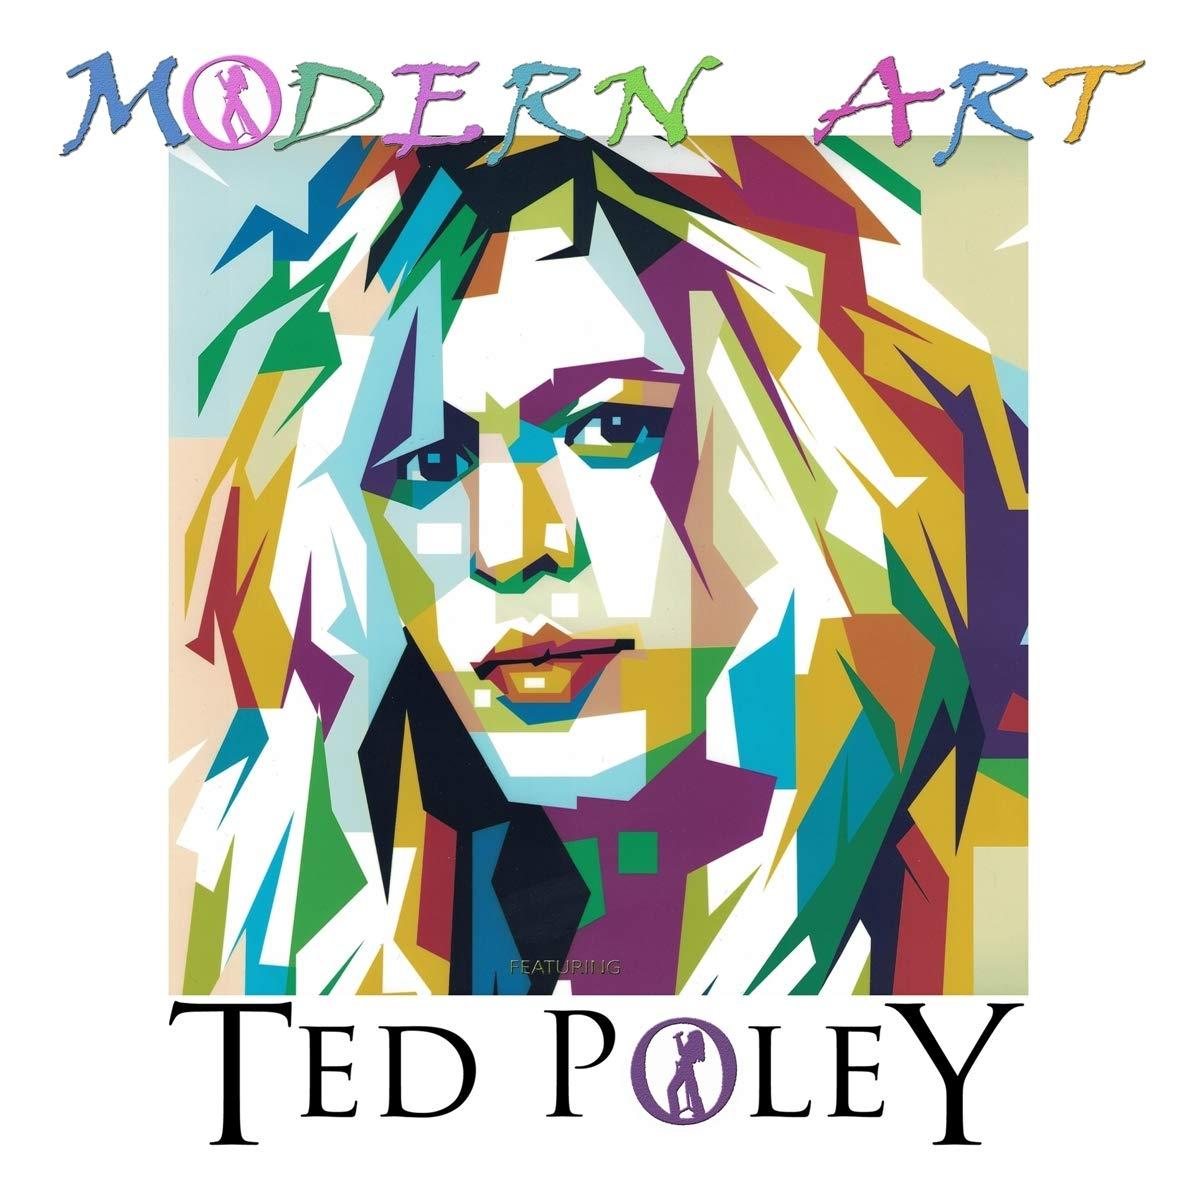 CD : MODERN ART / POLEY, TED - Modern Art (United Kingdom - Import)